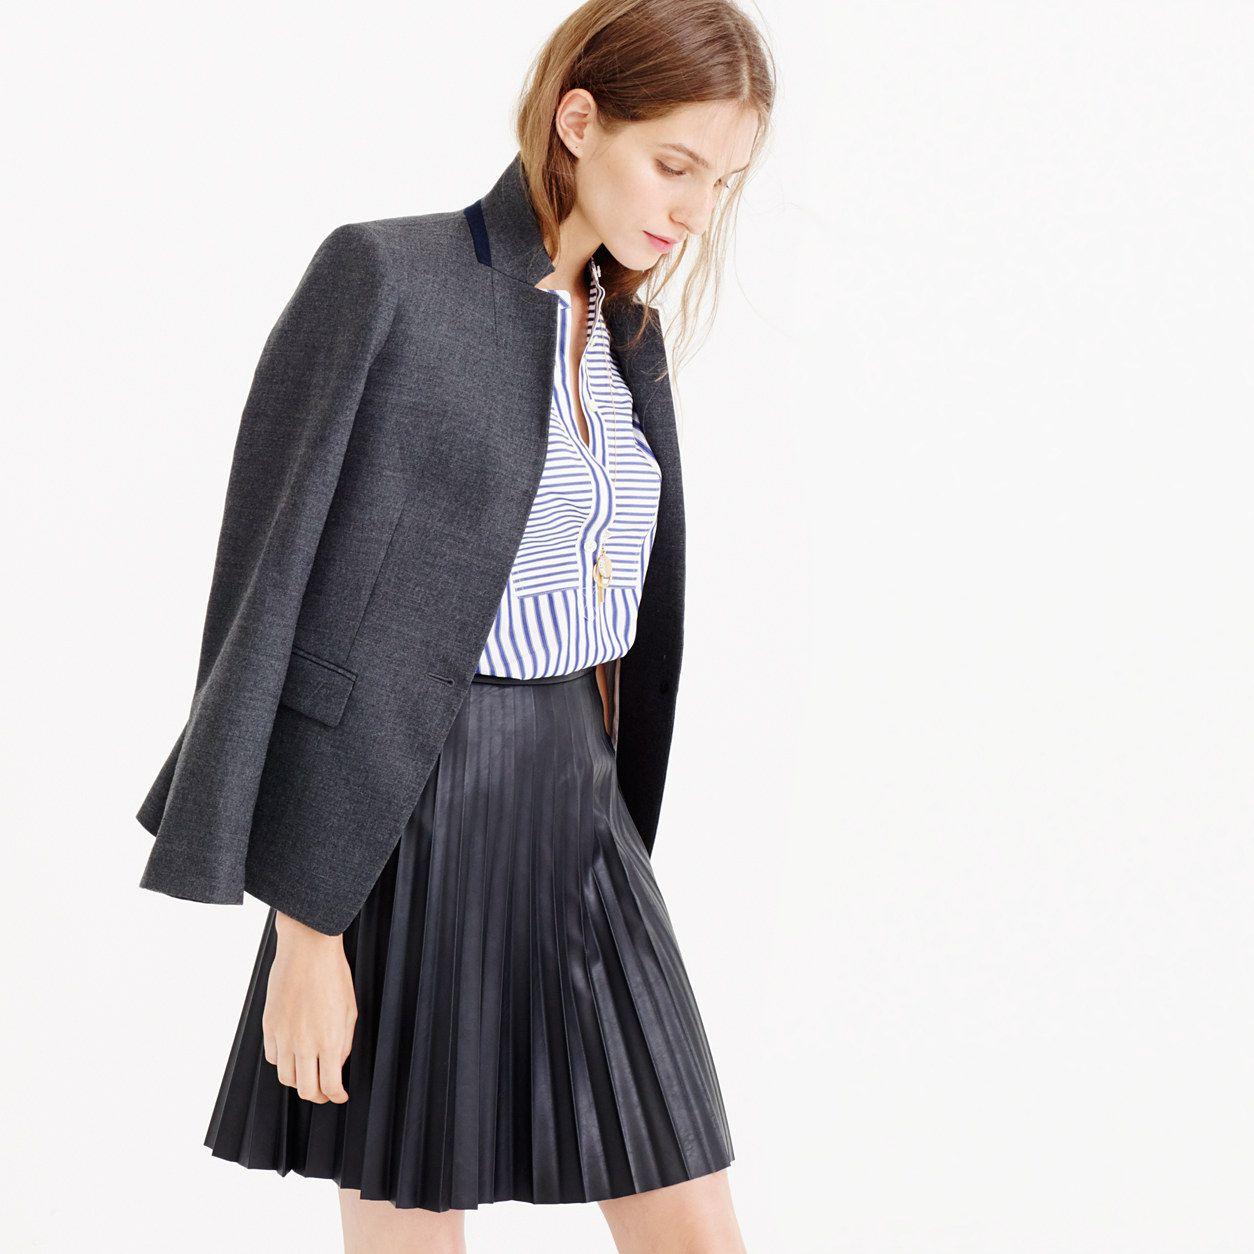 Black pleated school skirt fashion